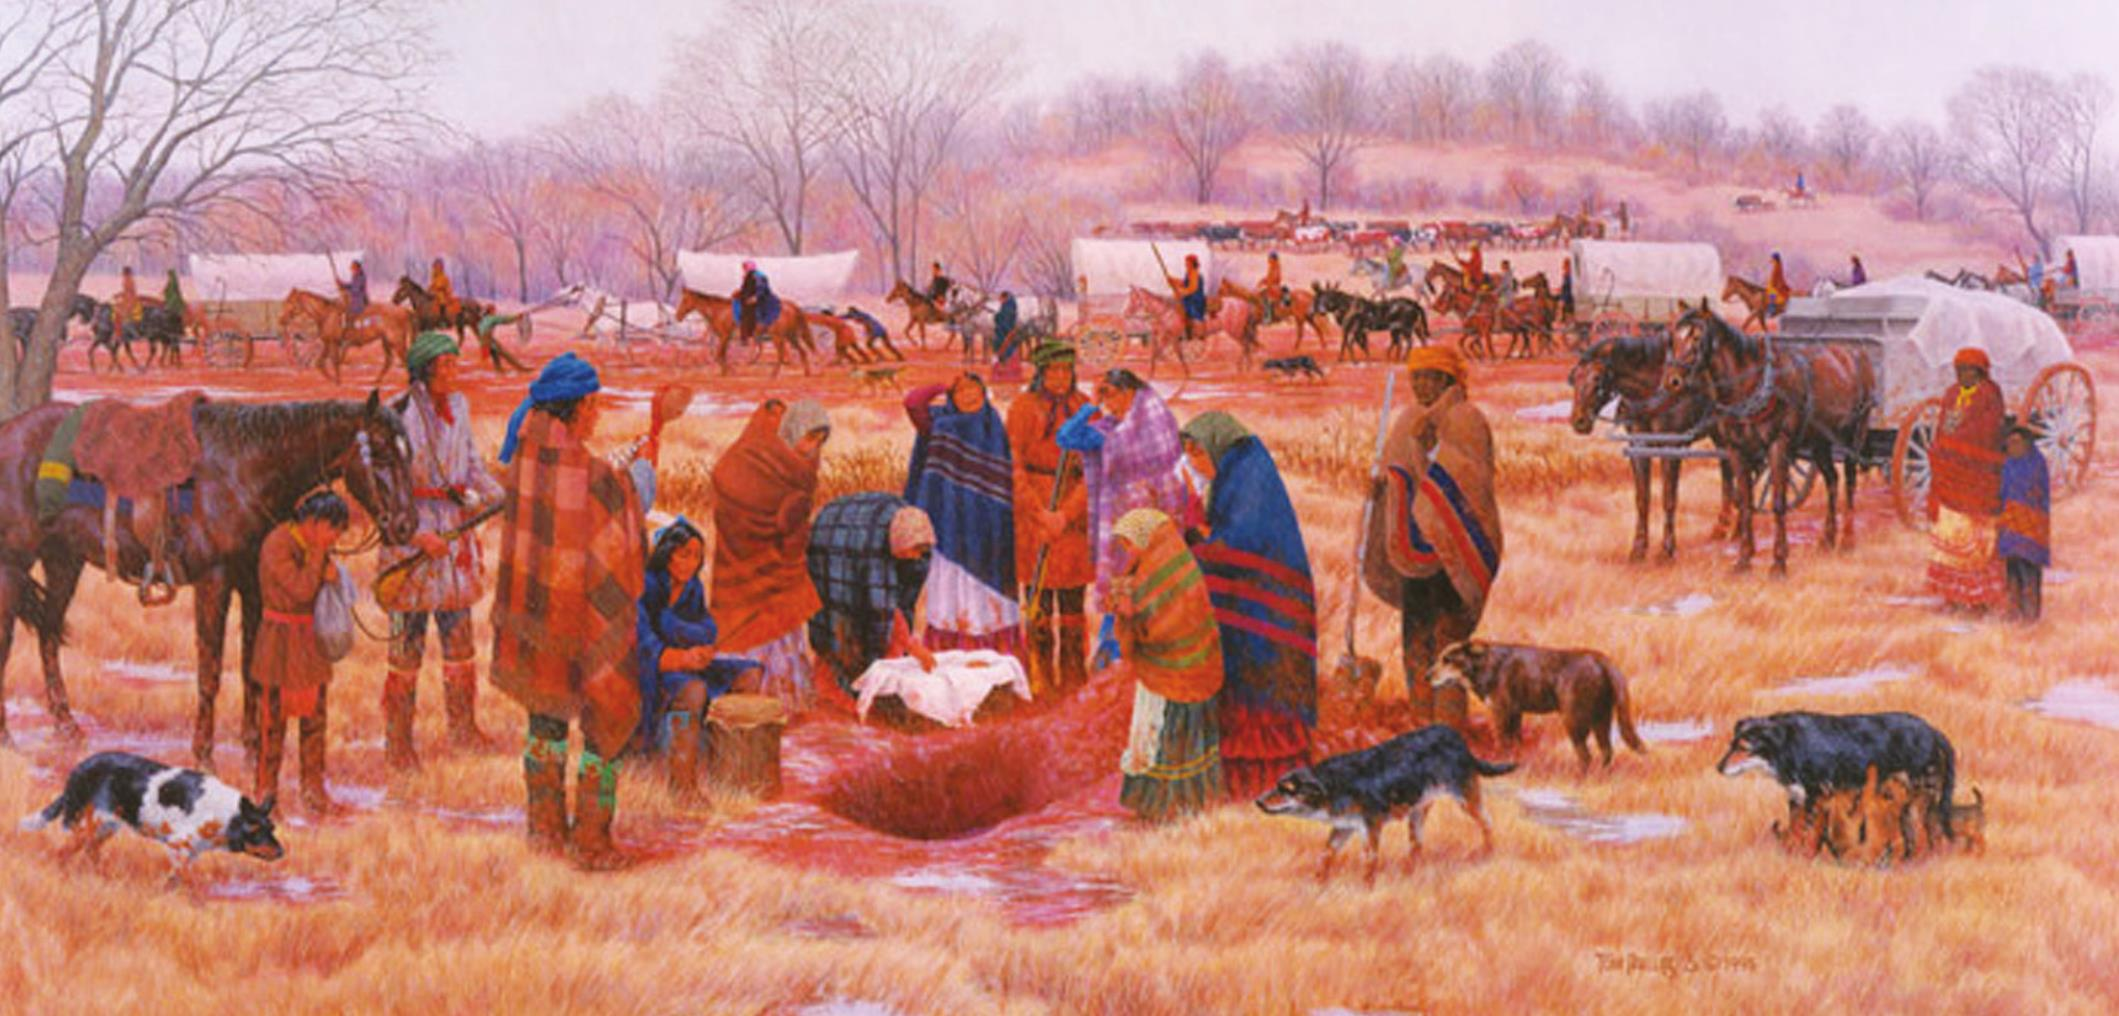 Chickasaw Nation Faced Many Hardships